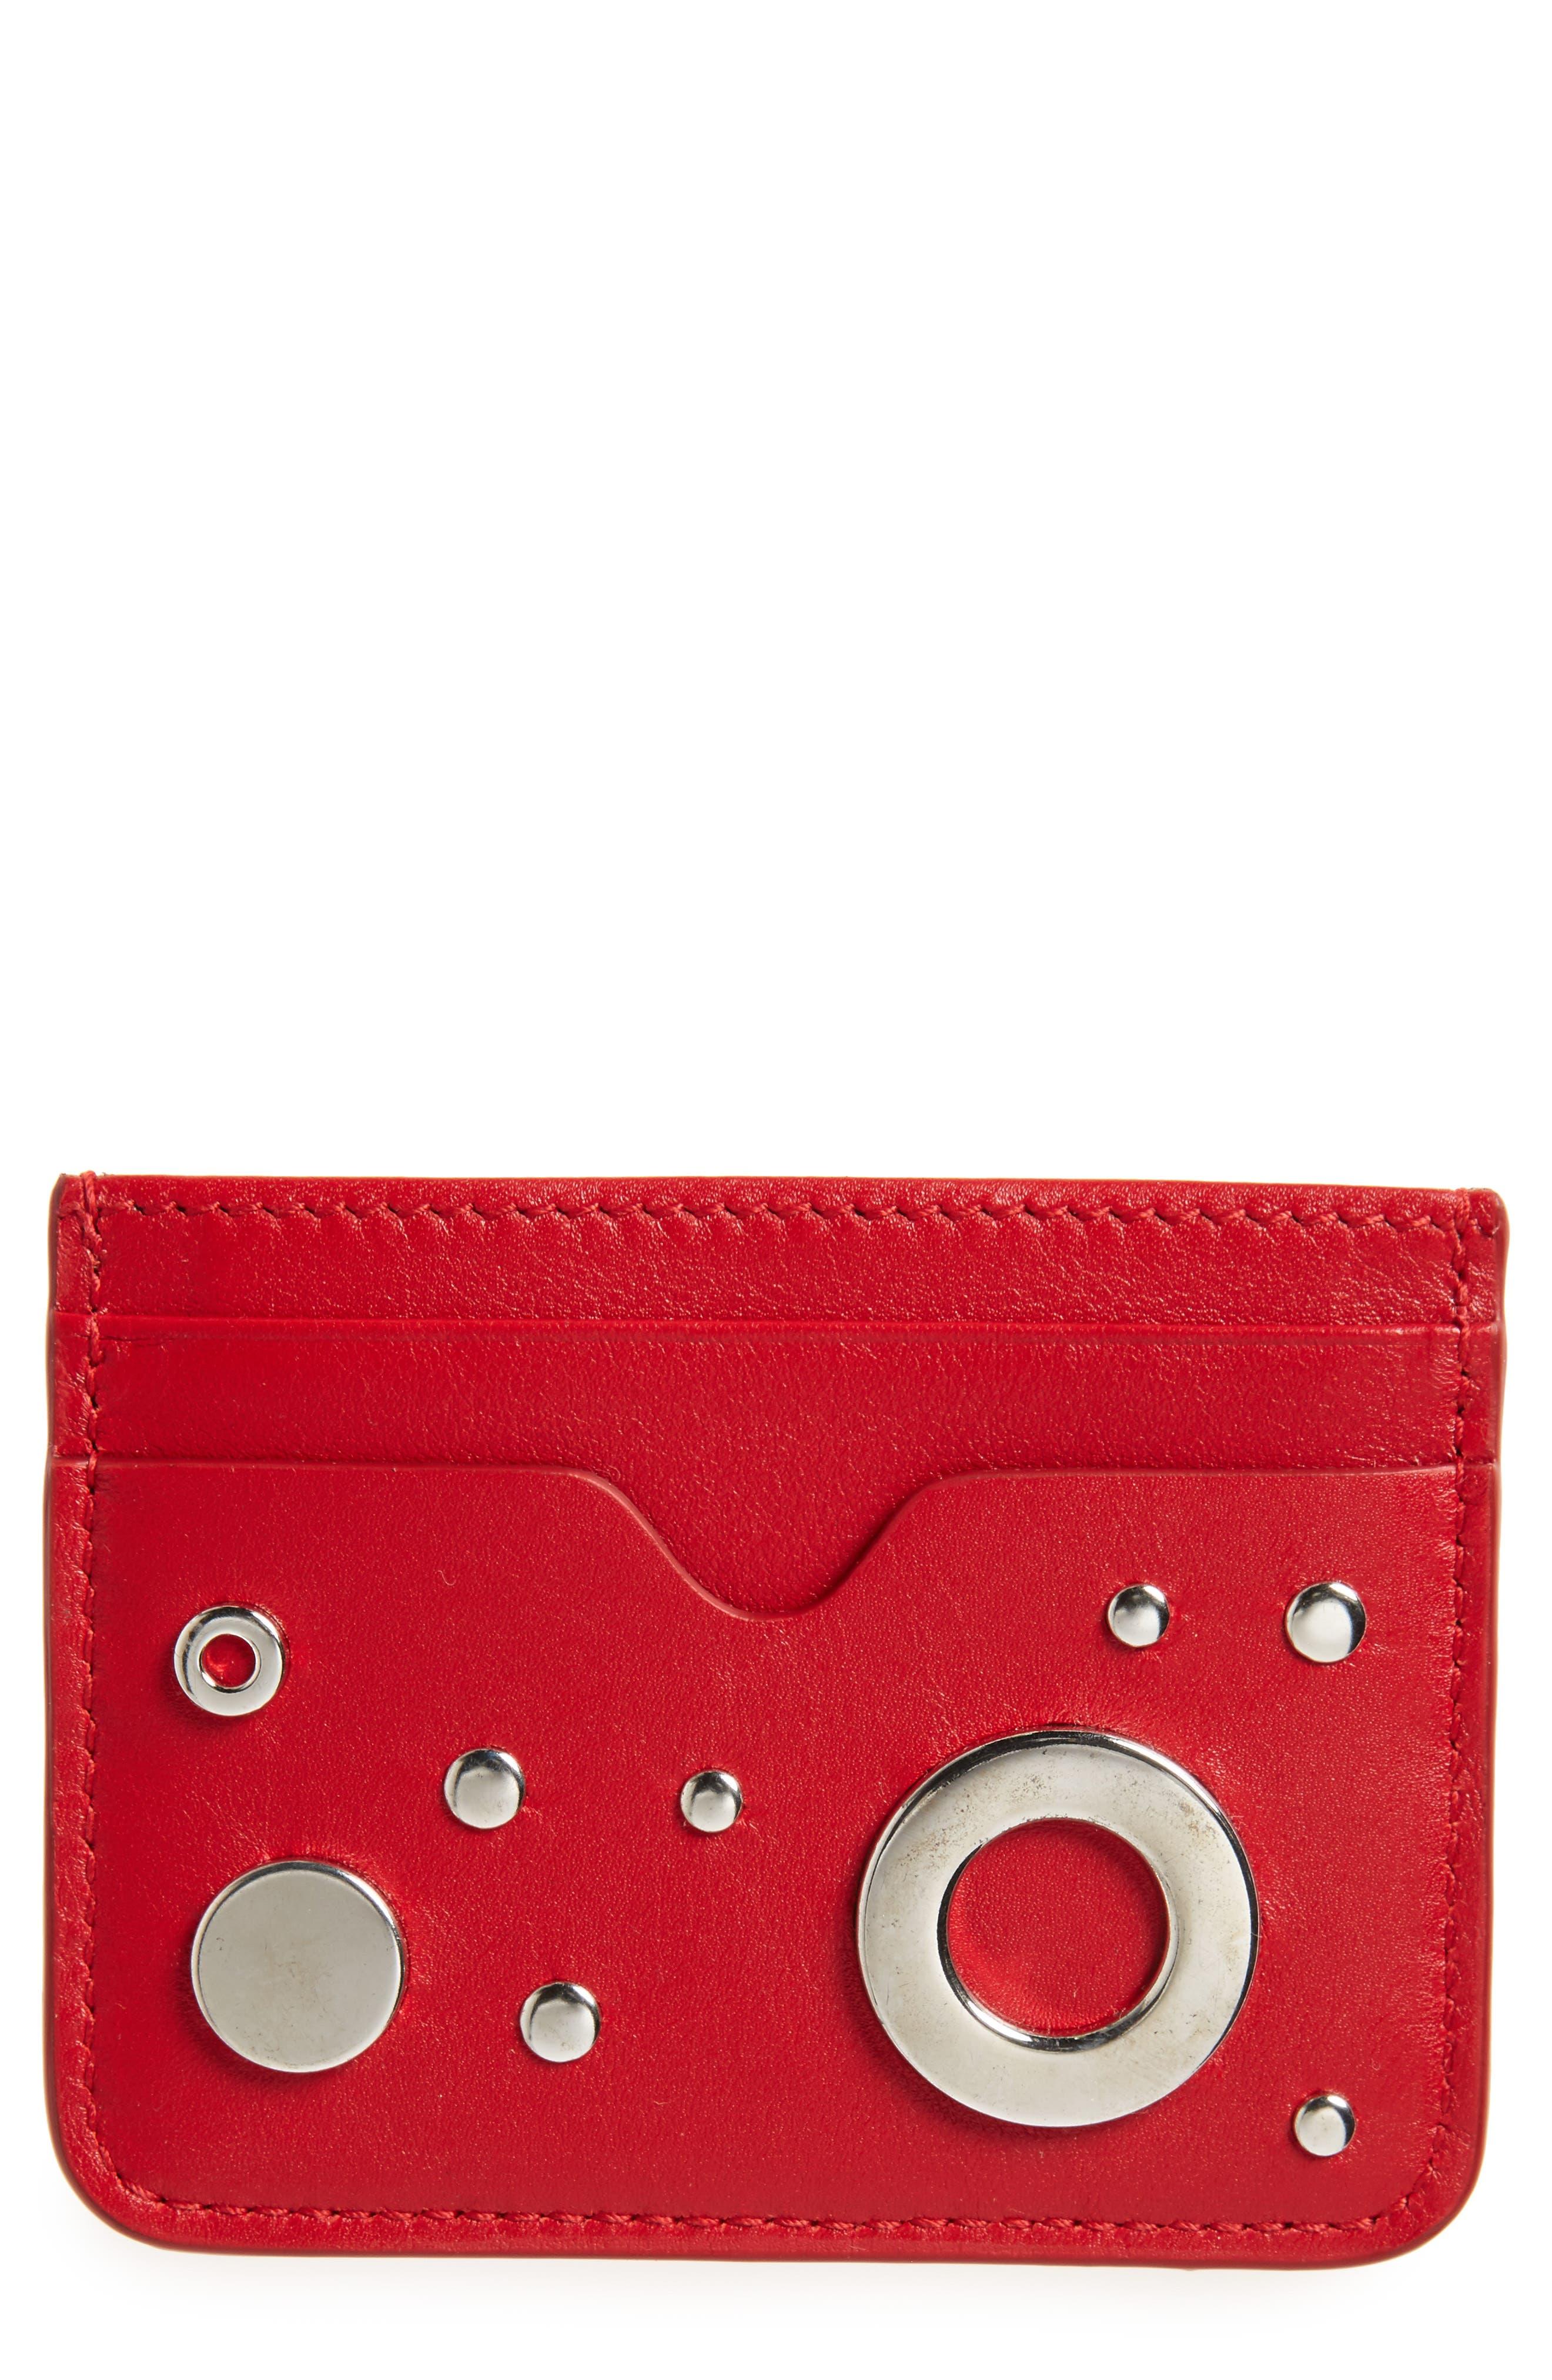 Alexander McQueen Grommet & Stud Calfskin Card Holder